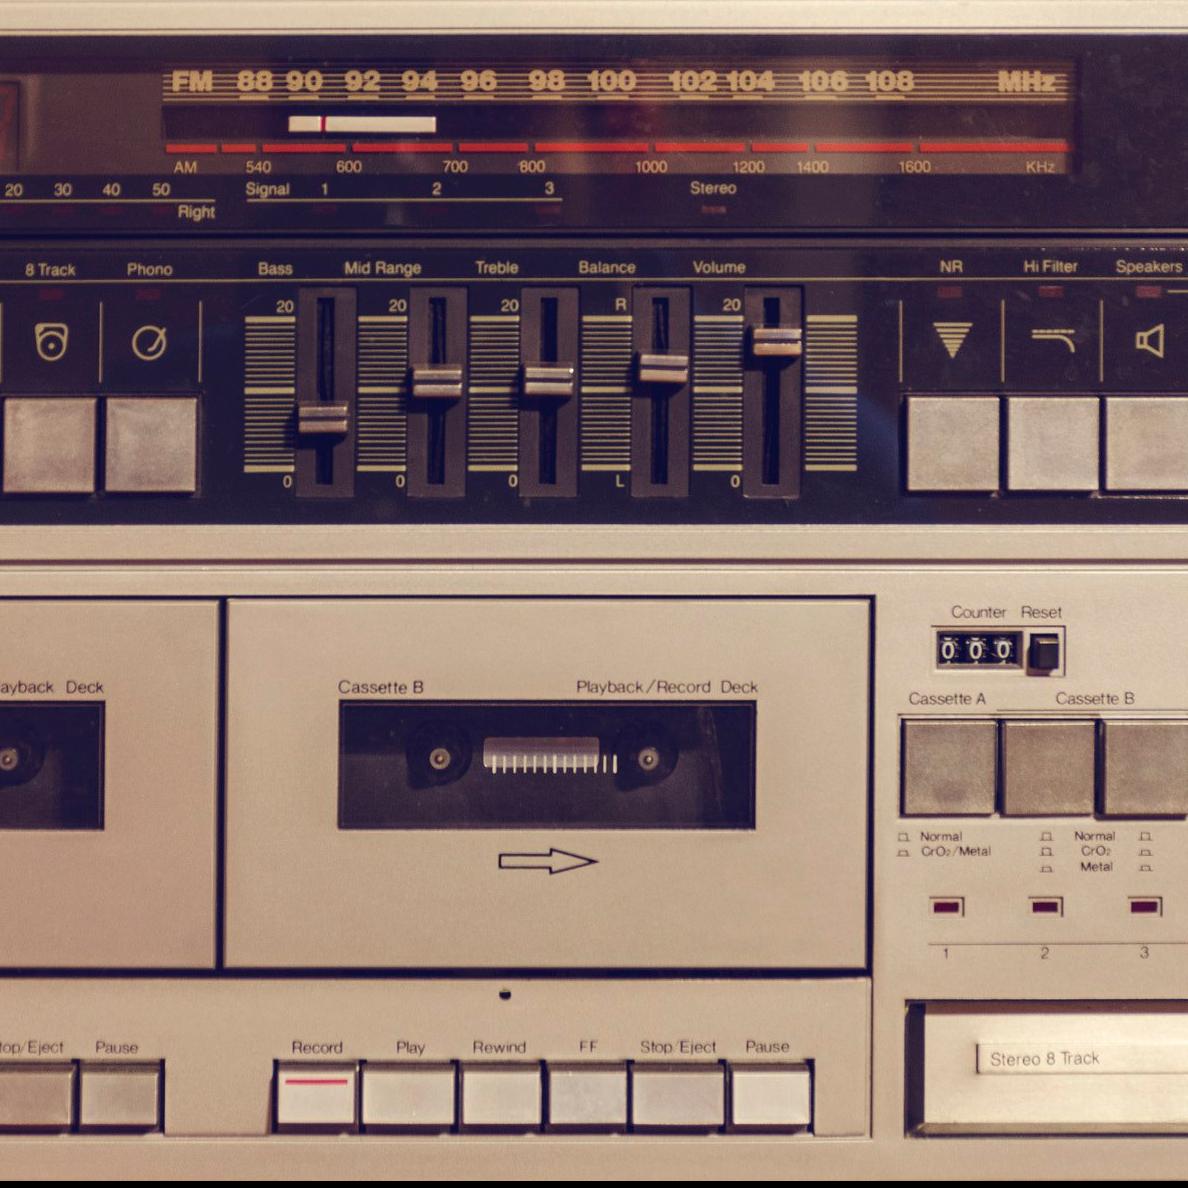 RadioProjetoFM